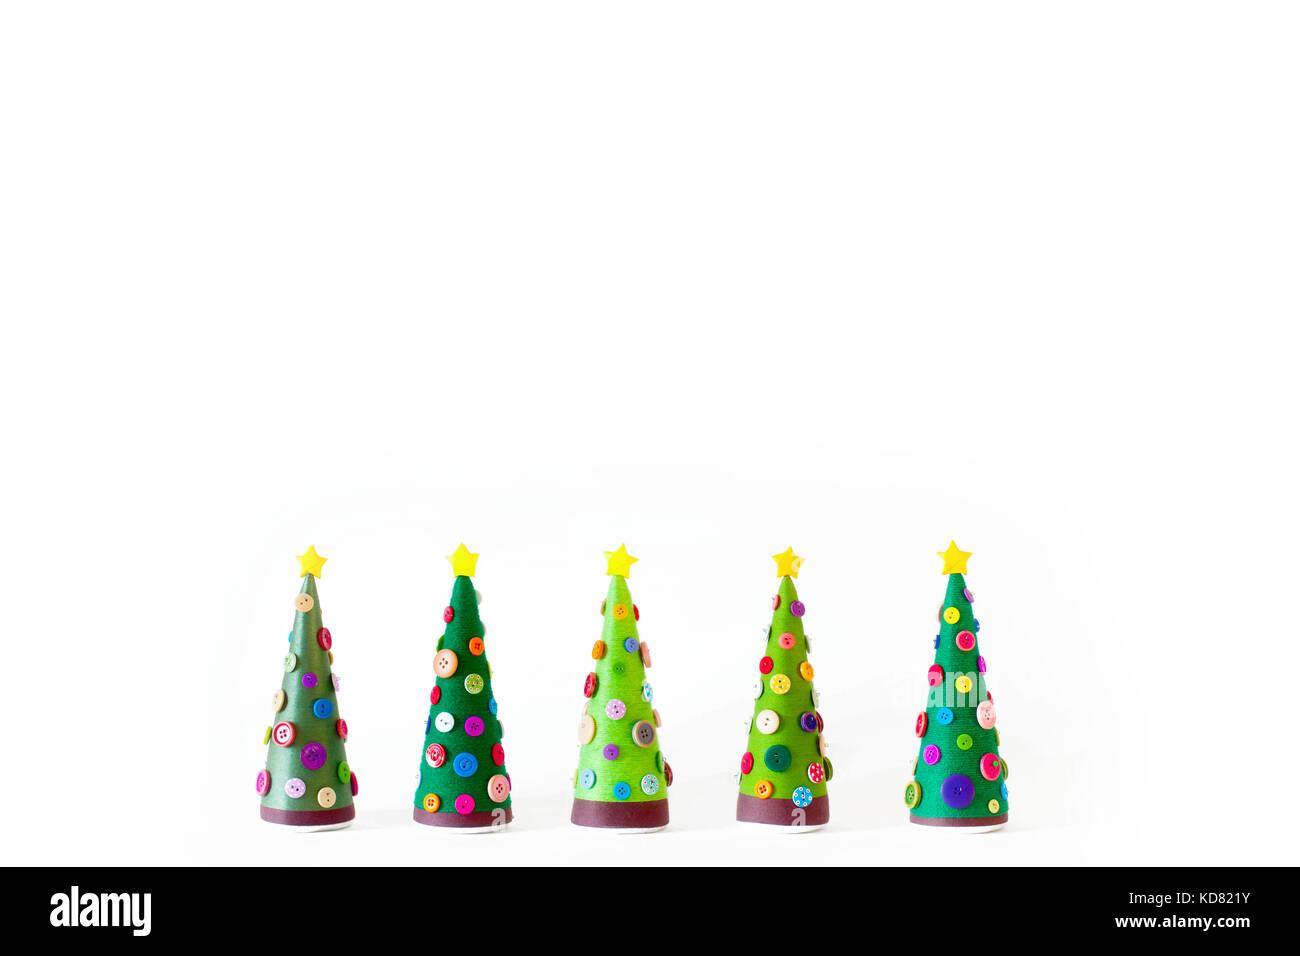 alternative christmas tree stockfotos alternative christmas tree bilder alamy. Black Bedroom Furniture Sets. Home Design Ideas